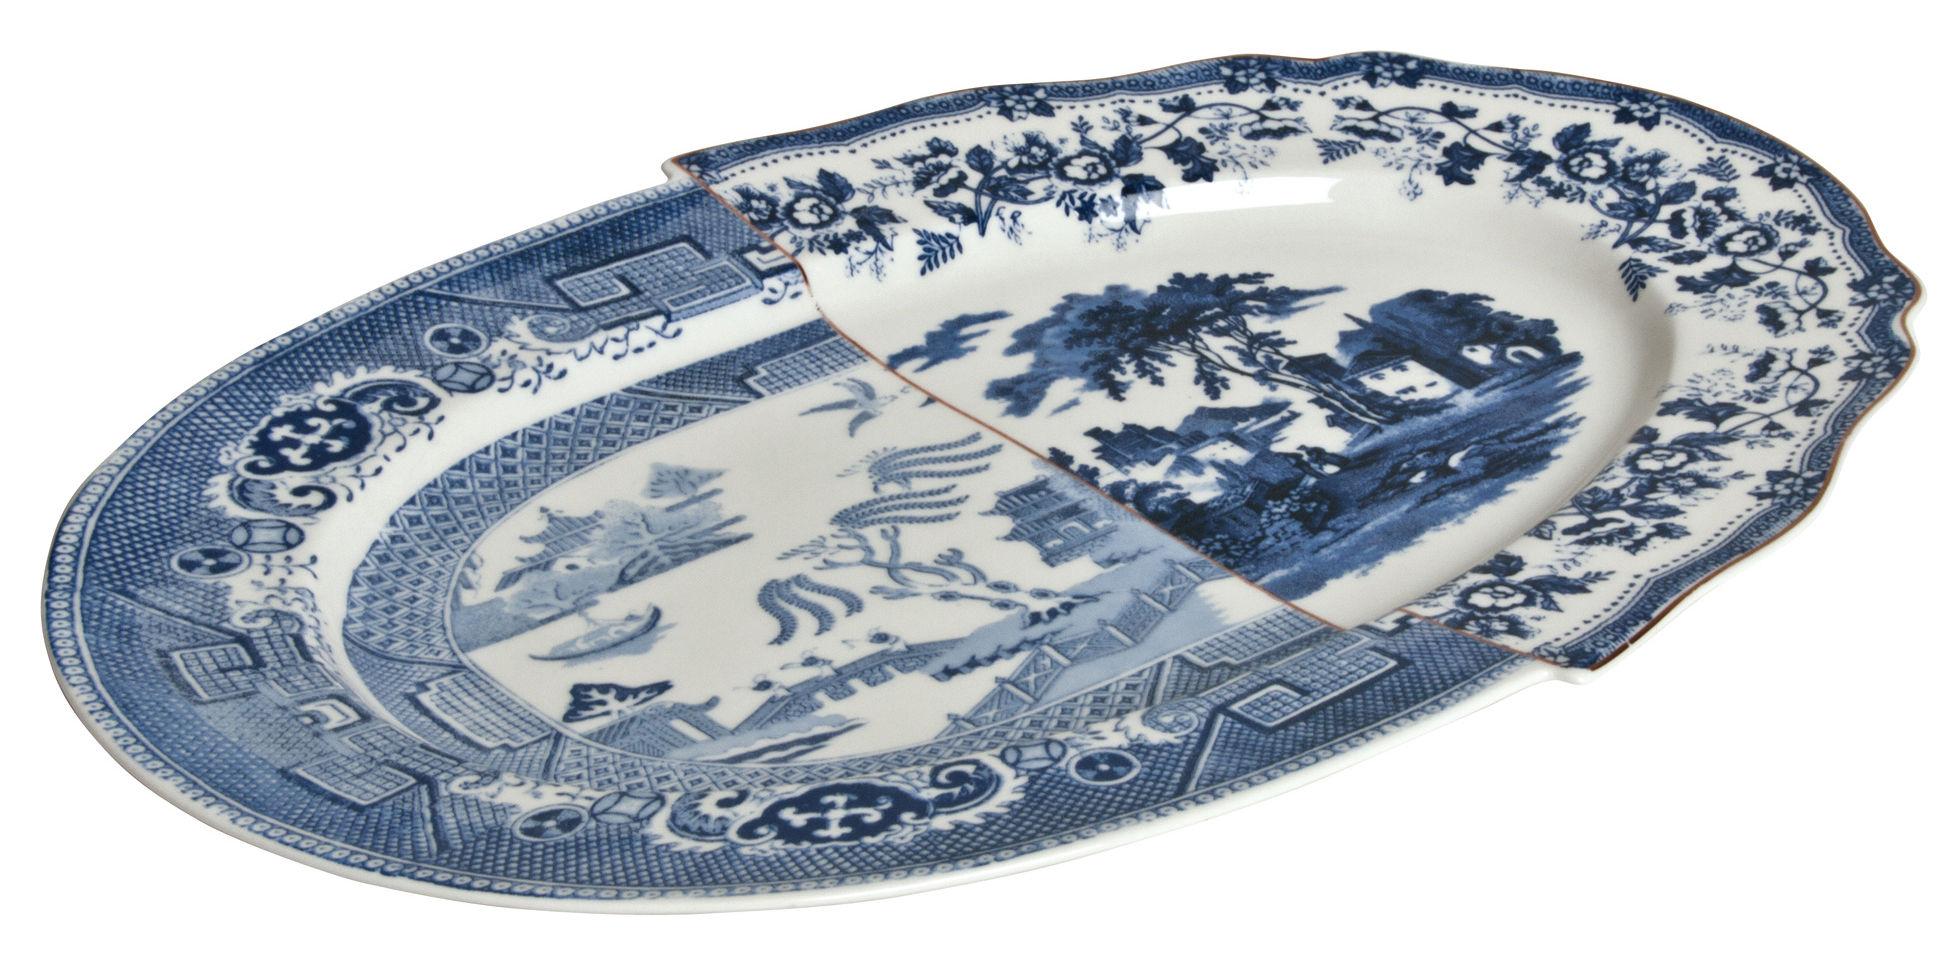 Arts de la table - Plats - Plat Hybrid Diomira / 37 x 24 cm - Seletti - Bleu - Porcelaine Bone China